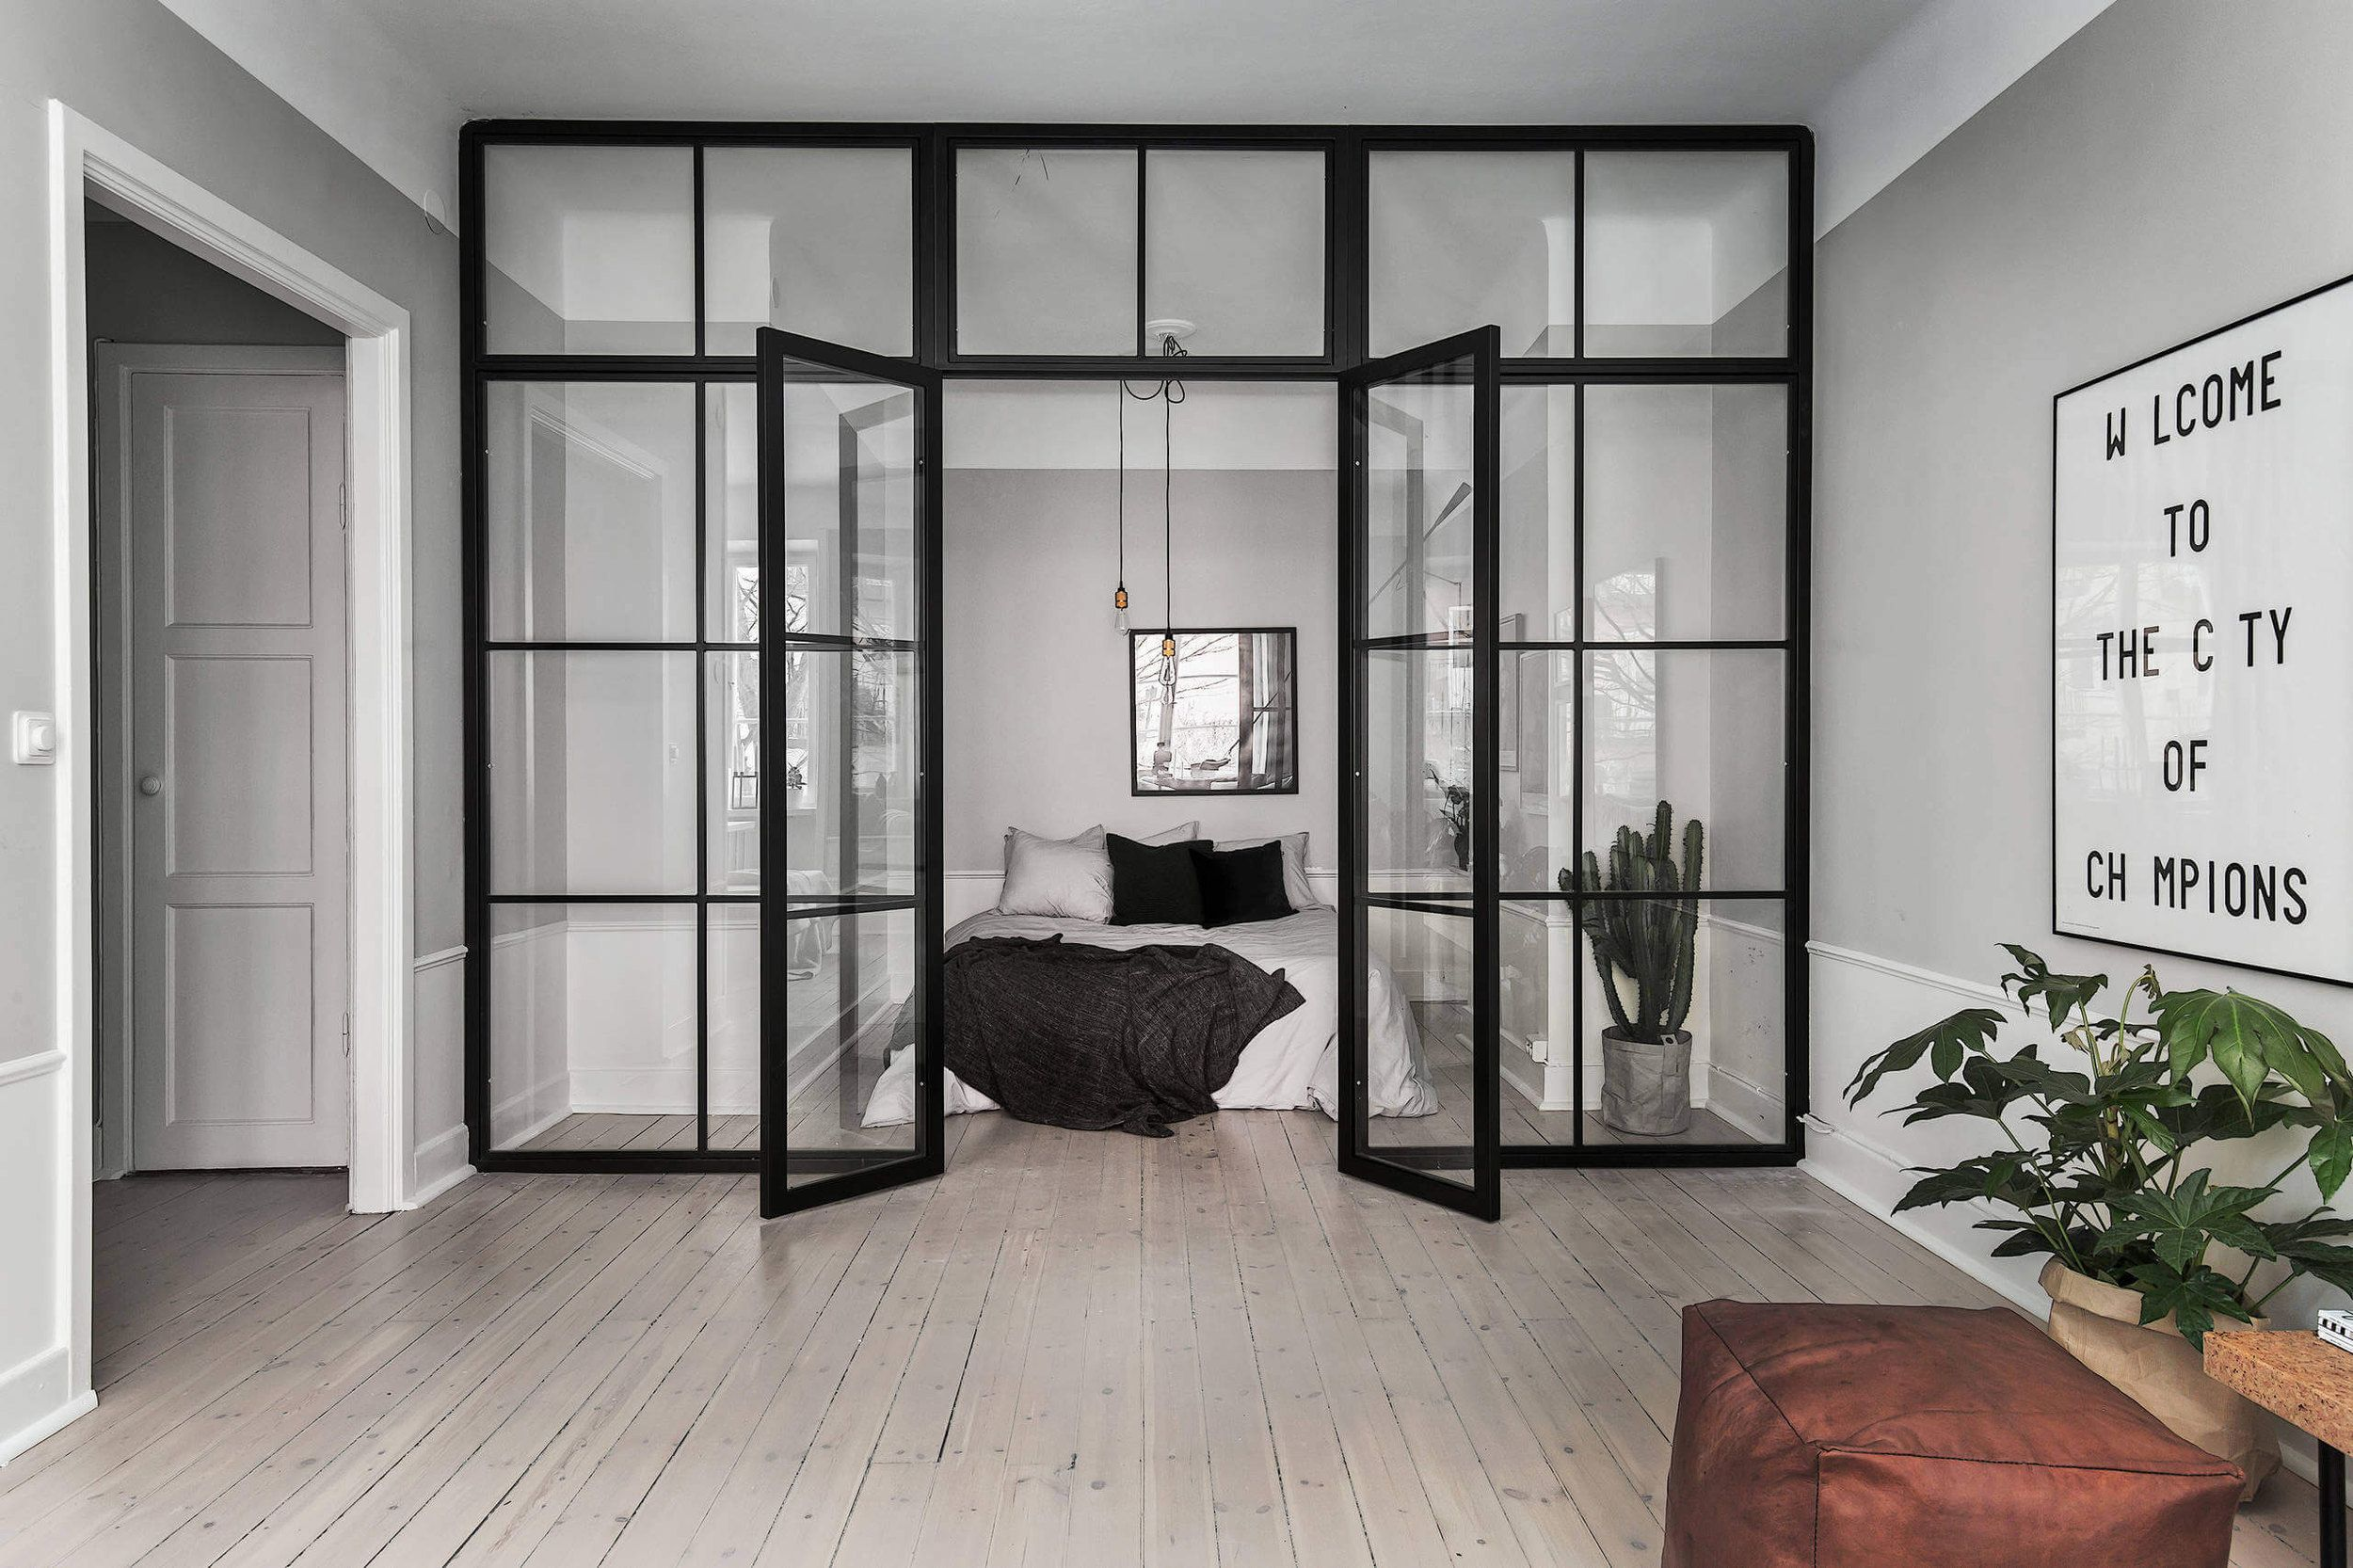 Stockholm Apartment Nordique Nordic Lifestyle Scandinavian Design Nordic Products Scandinavian Travel Apartment Inspiration Apartment Design Home